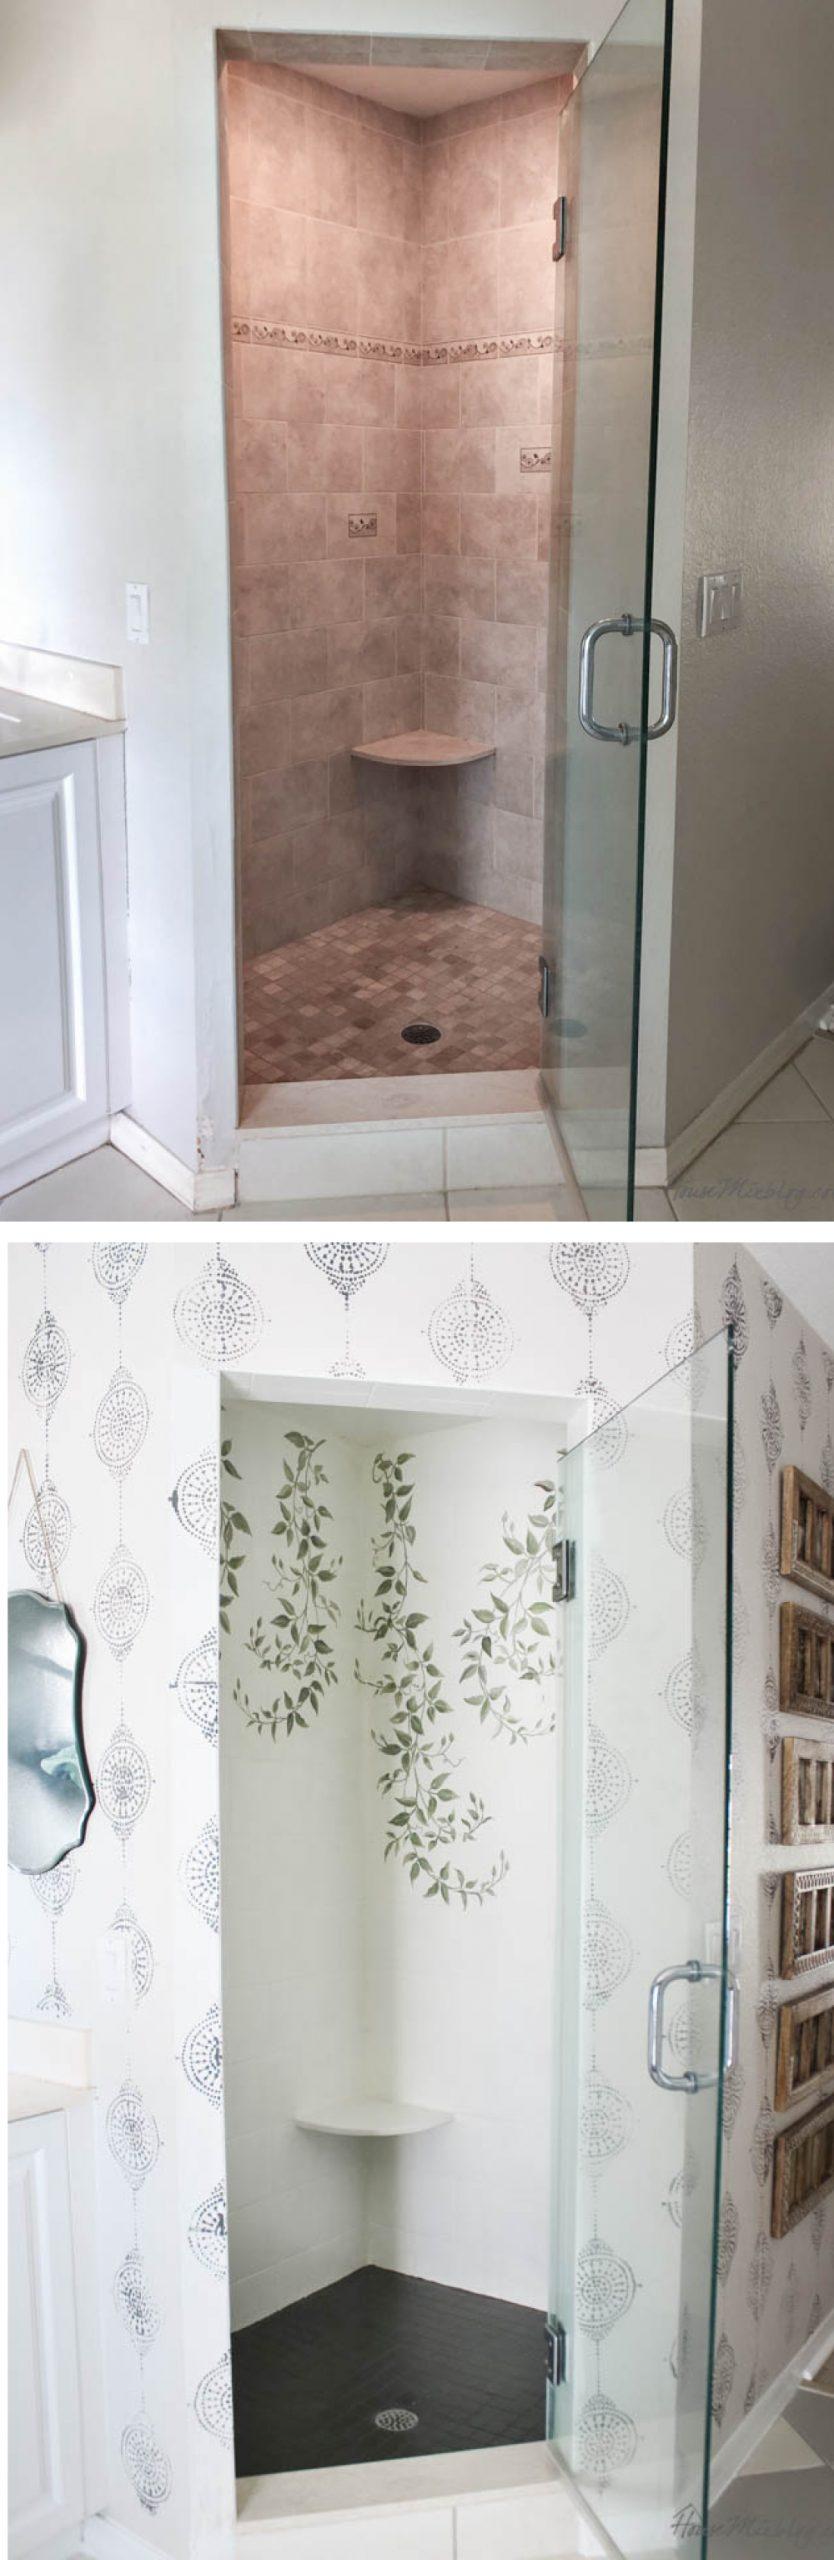 How To Paint Bathroom Tile Floor Shower Backsplash House Mix